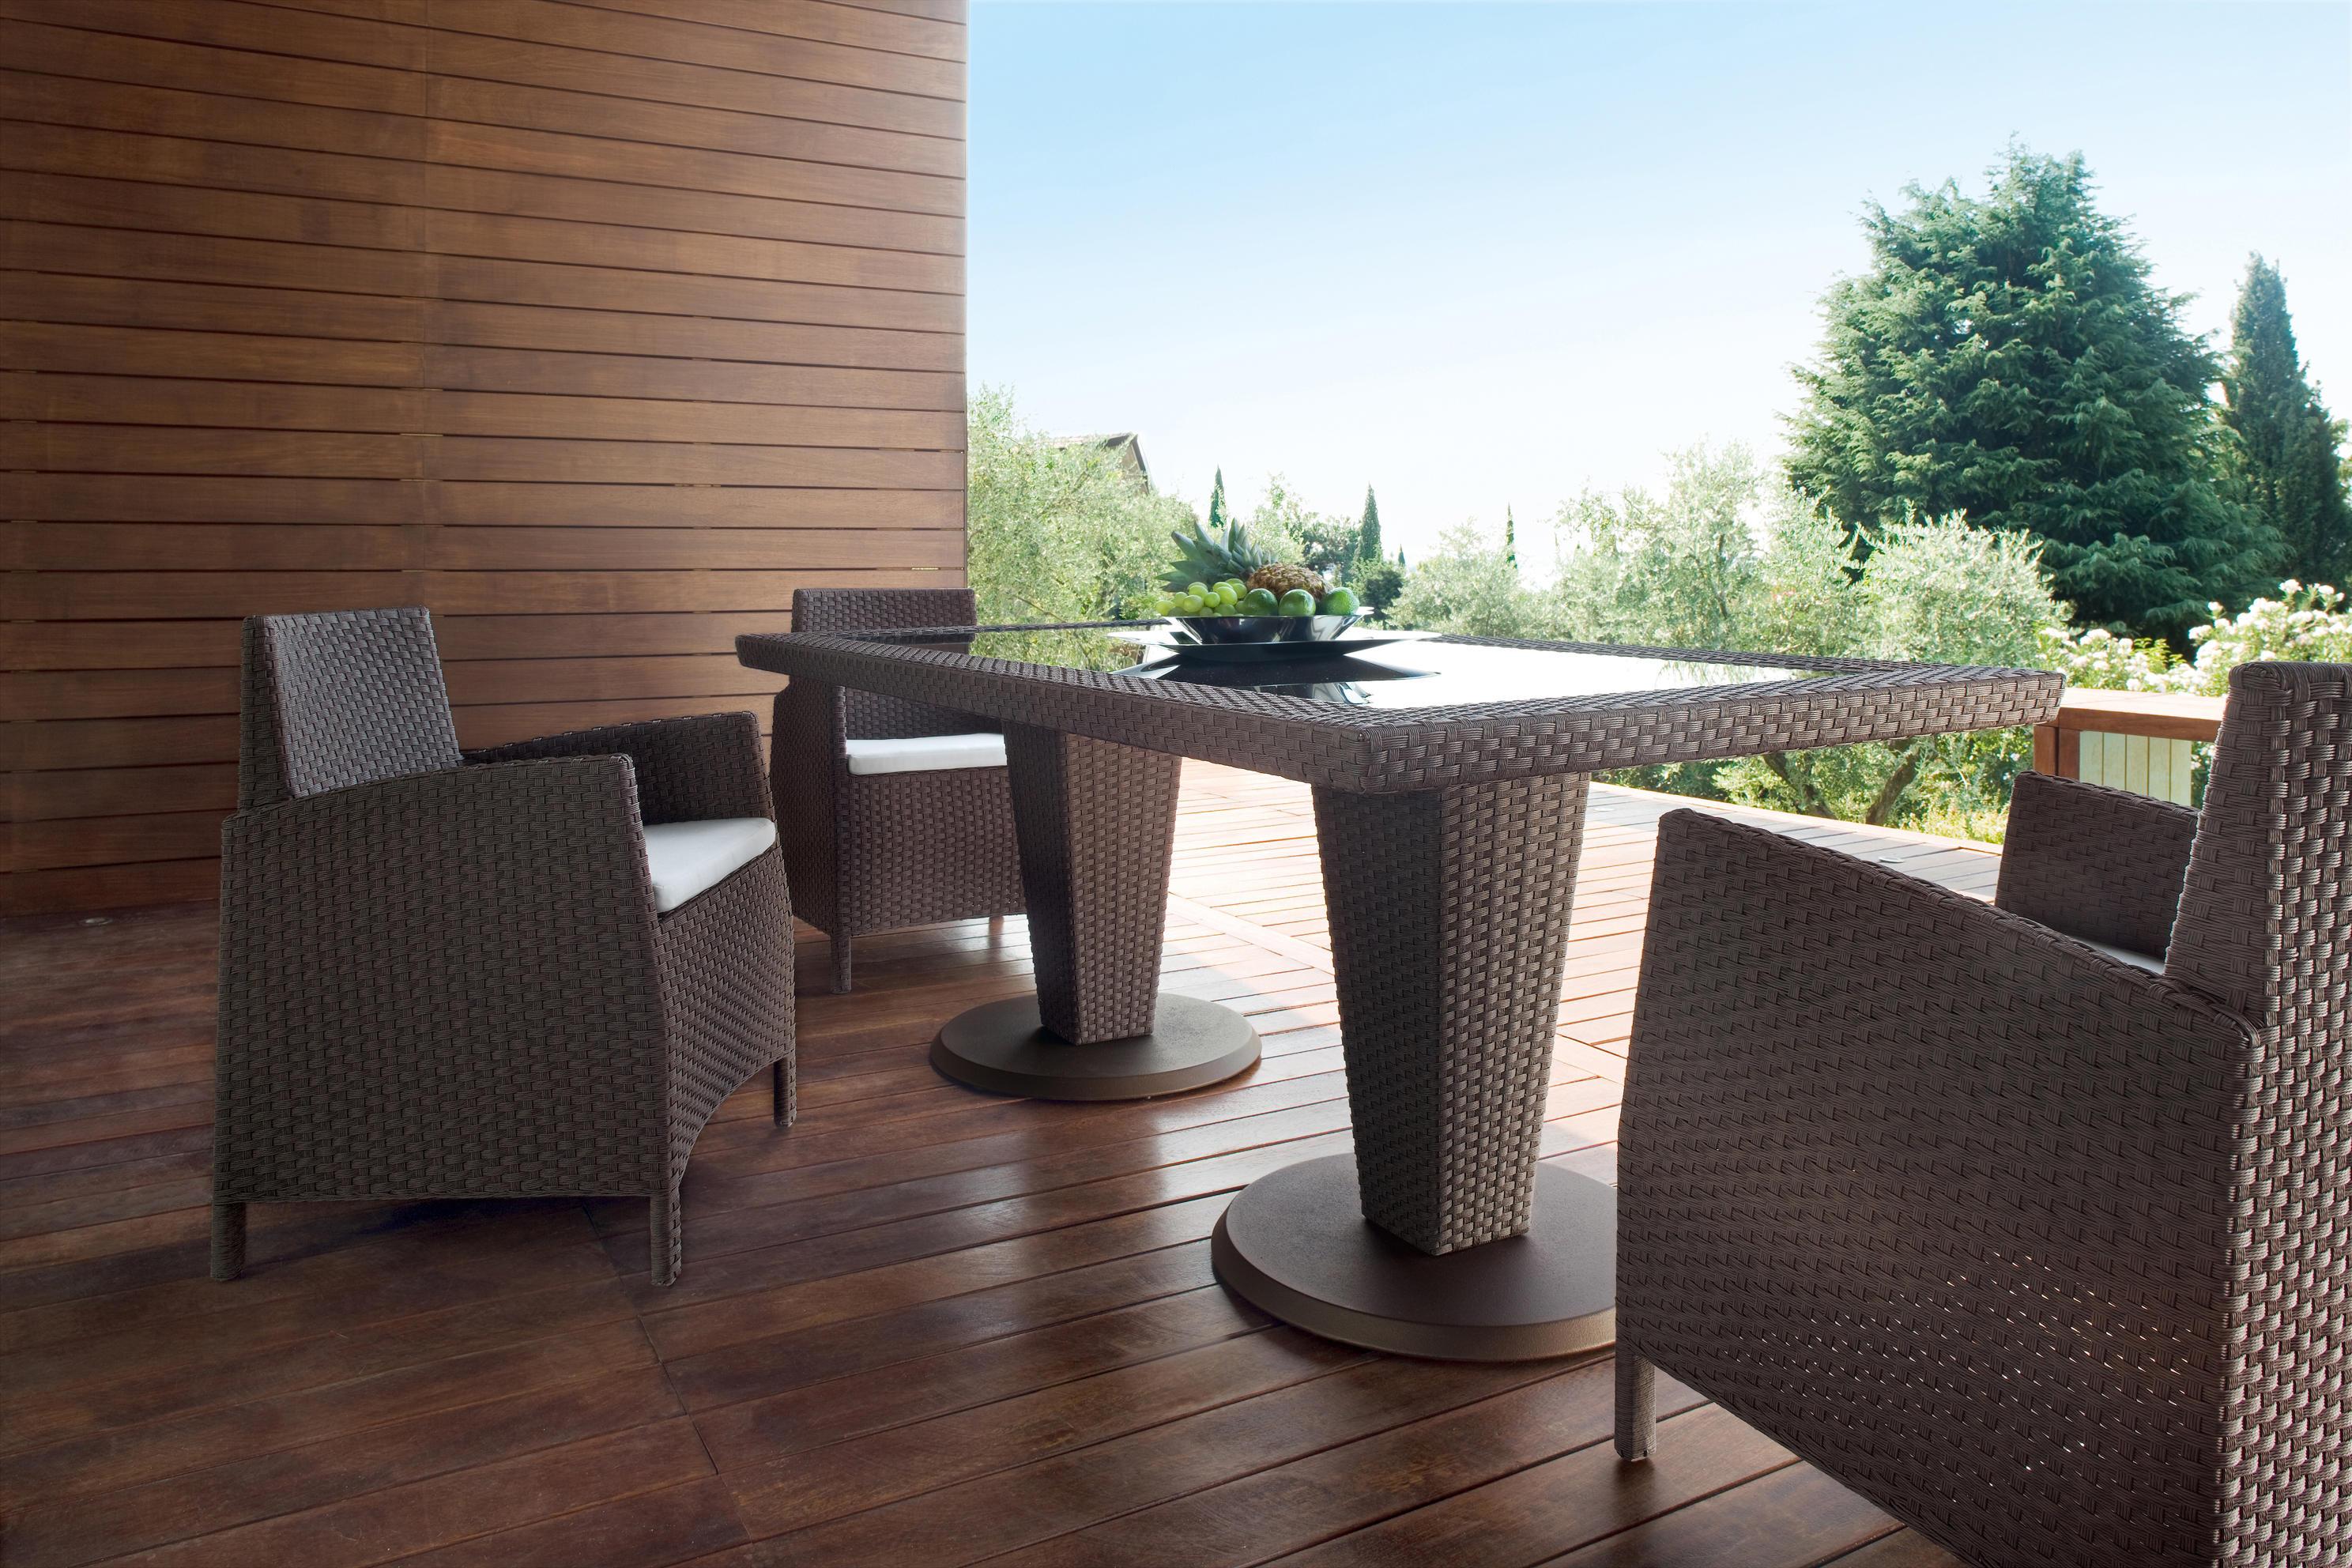 Tavoli Da Giardino Vimini.Sedie In Vimini Per Interni Free Download By Tablet With Sedie In